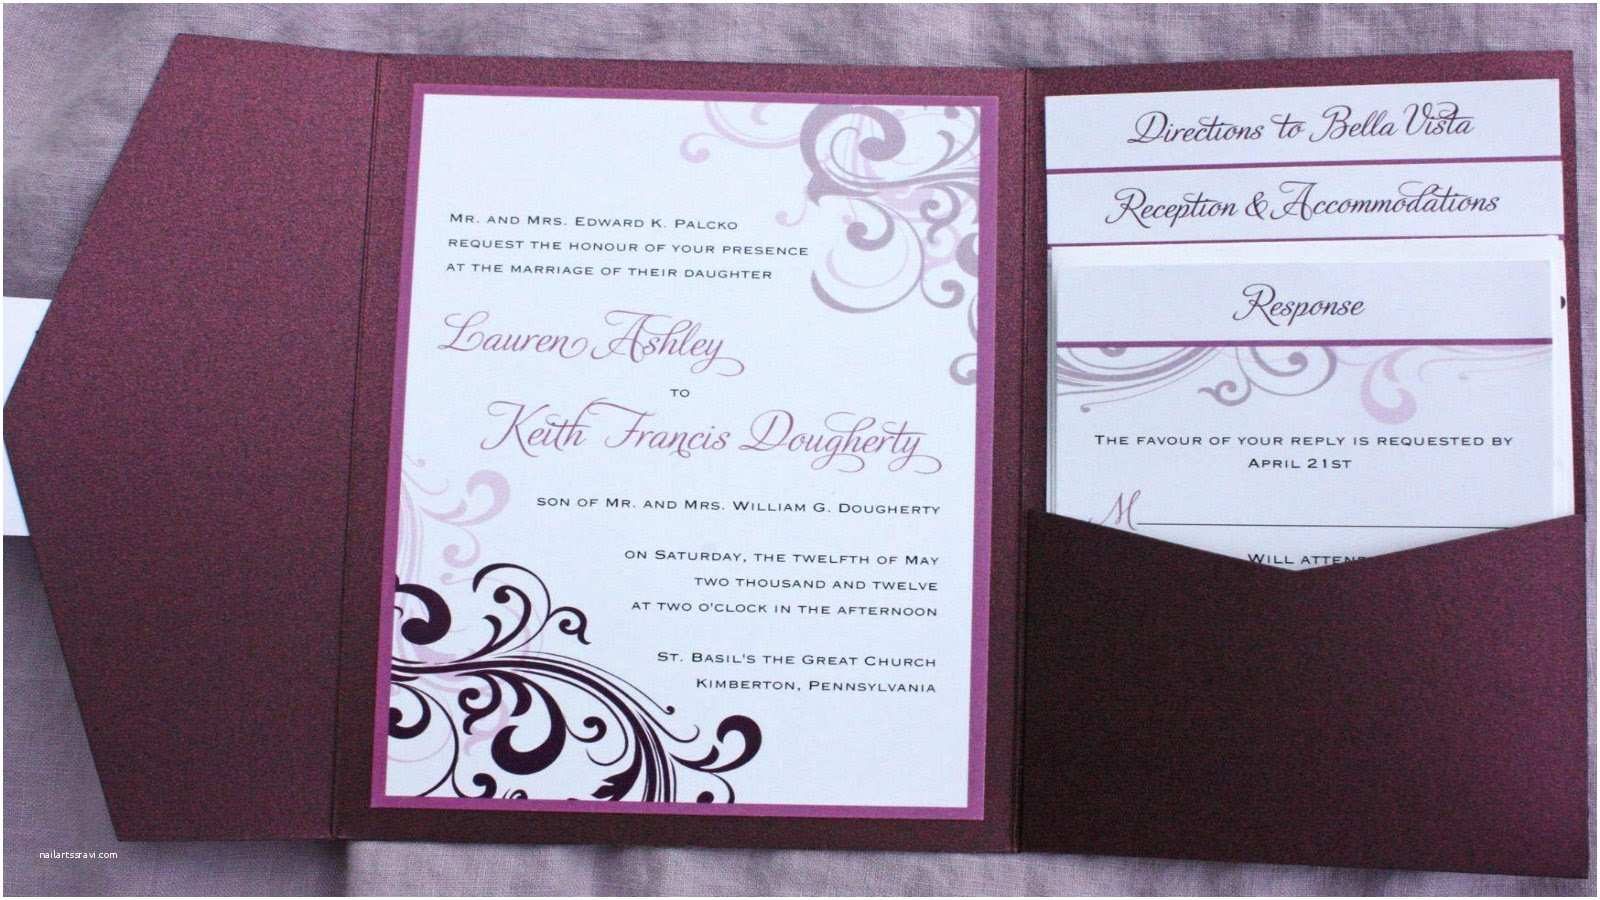 How to Print Wedding Invitations How to Make Wedding Invitations